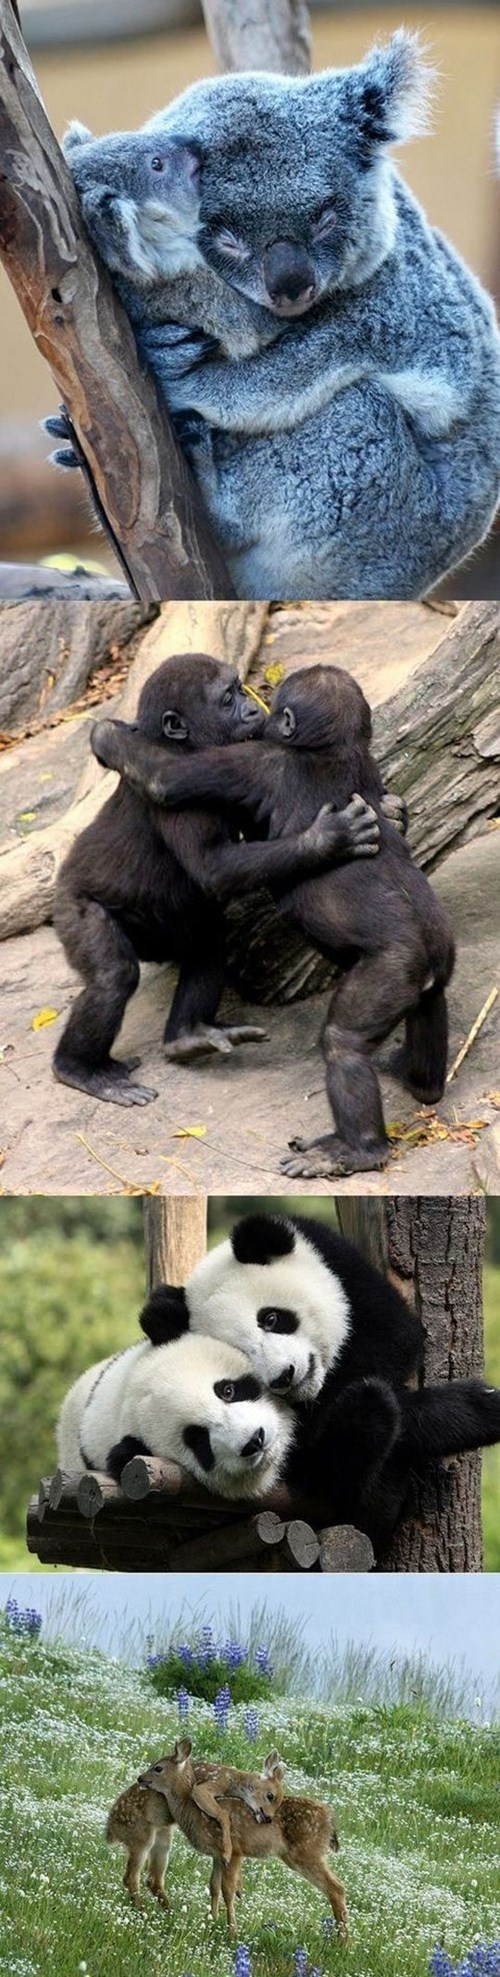 animals,cute,hugging,squee